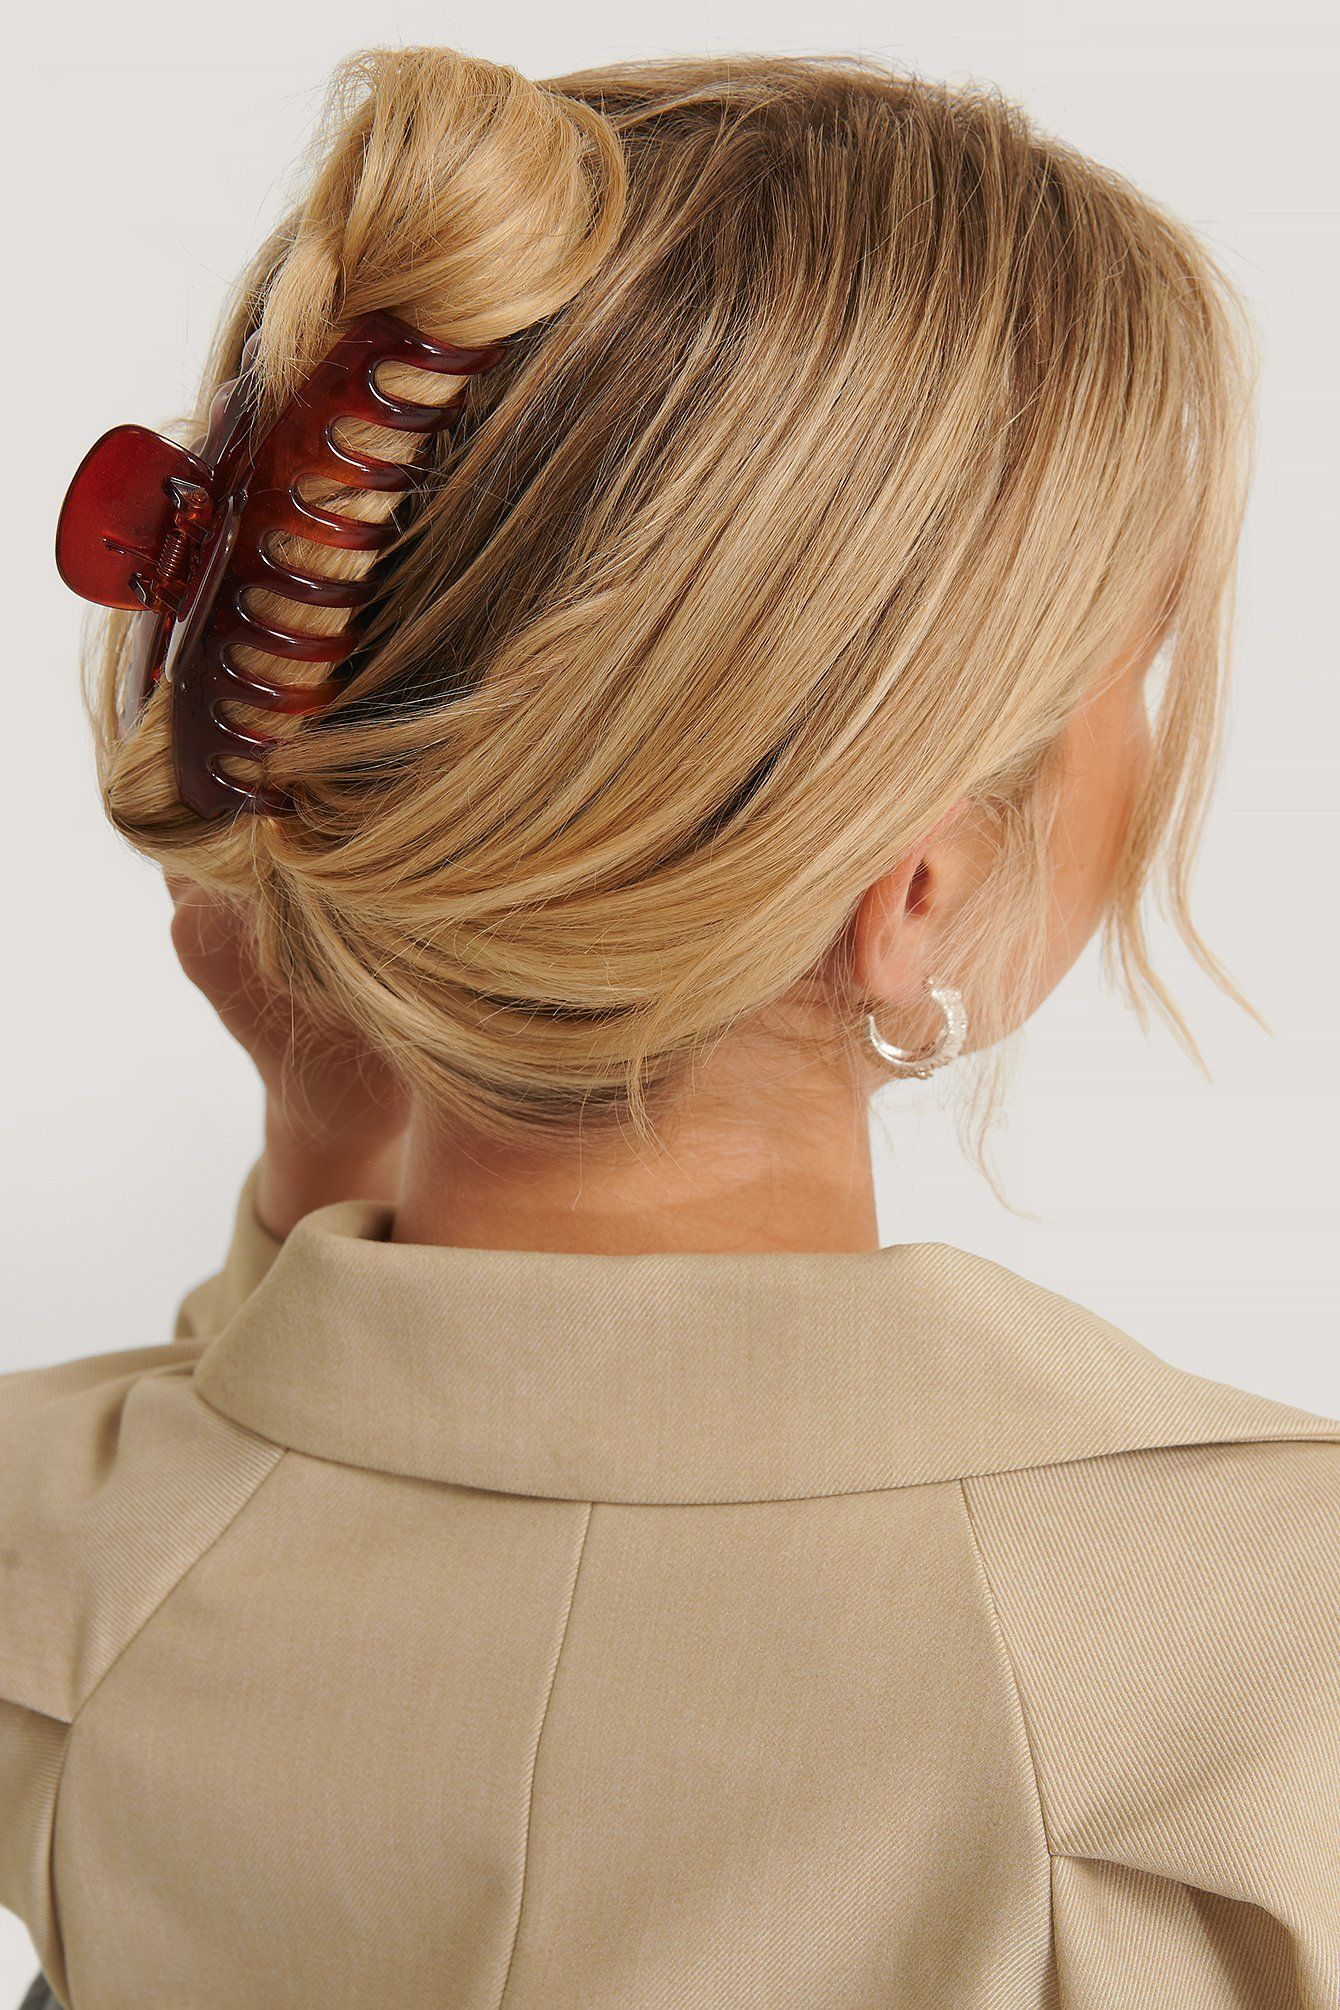 Grosse Runde Harz Haarspange Braun In 2020 Hubsche Frisuren Haar Styling Haarschonheit